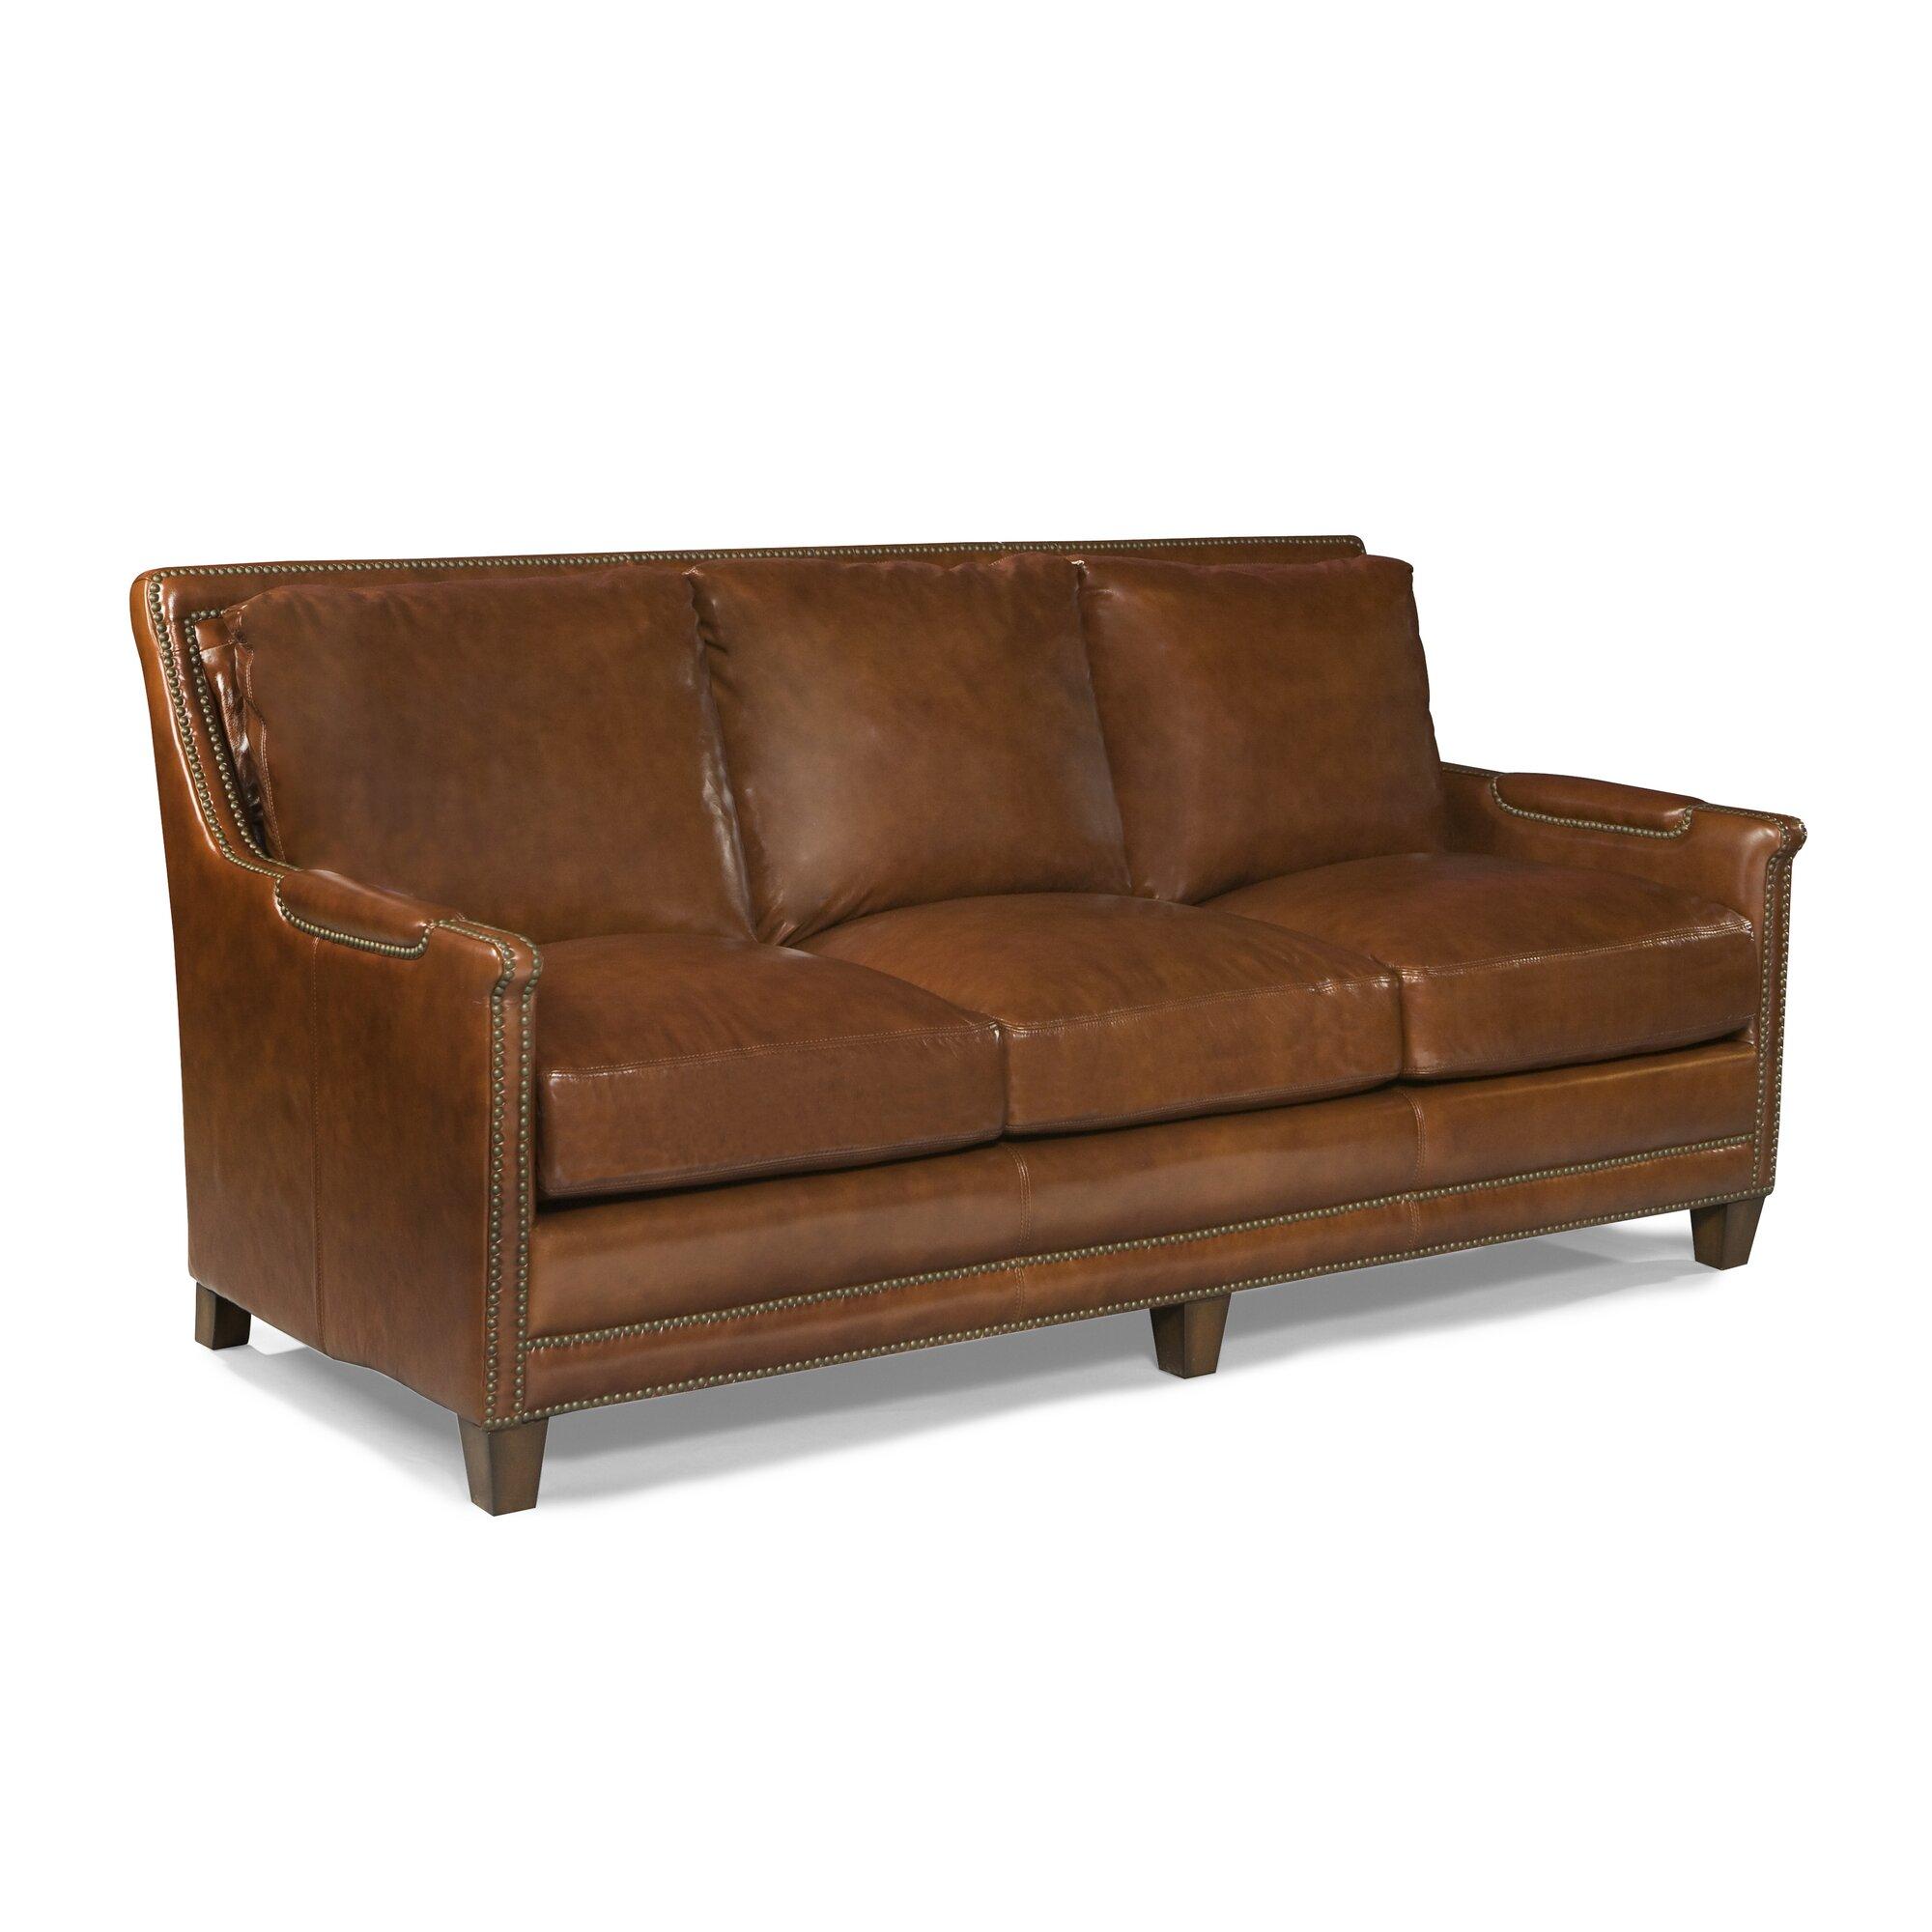 High Quality ... Marissa 78 Leather Sofa · Arizona ...